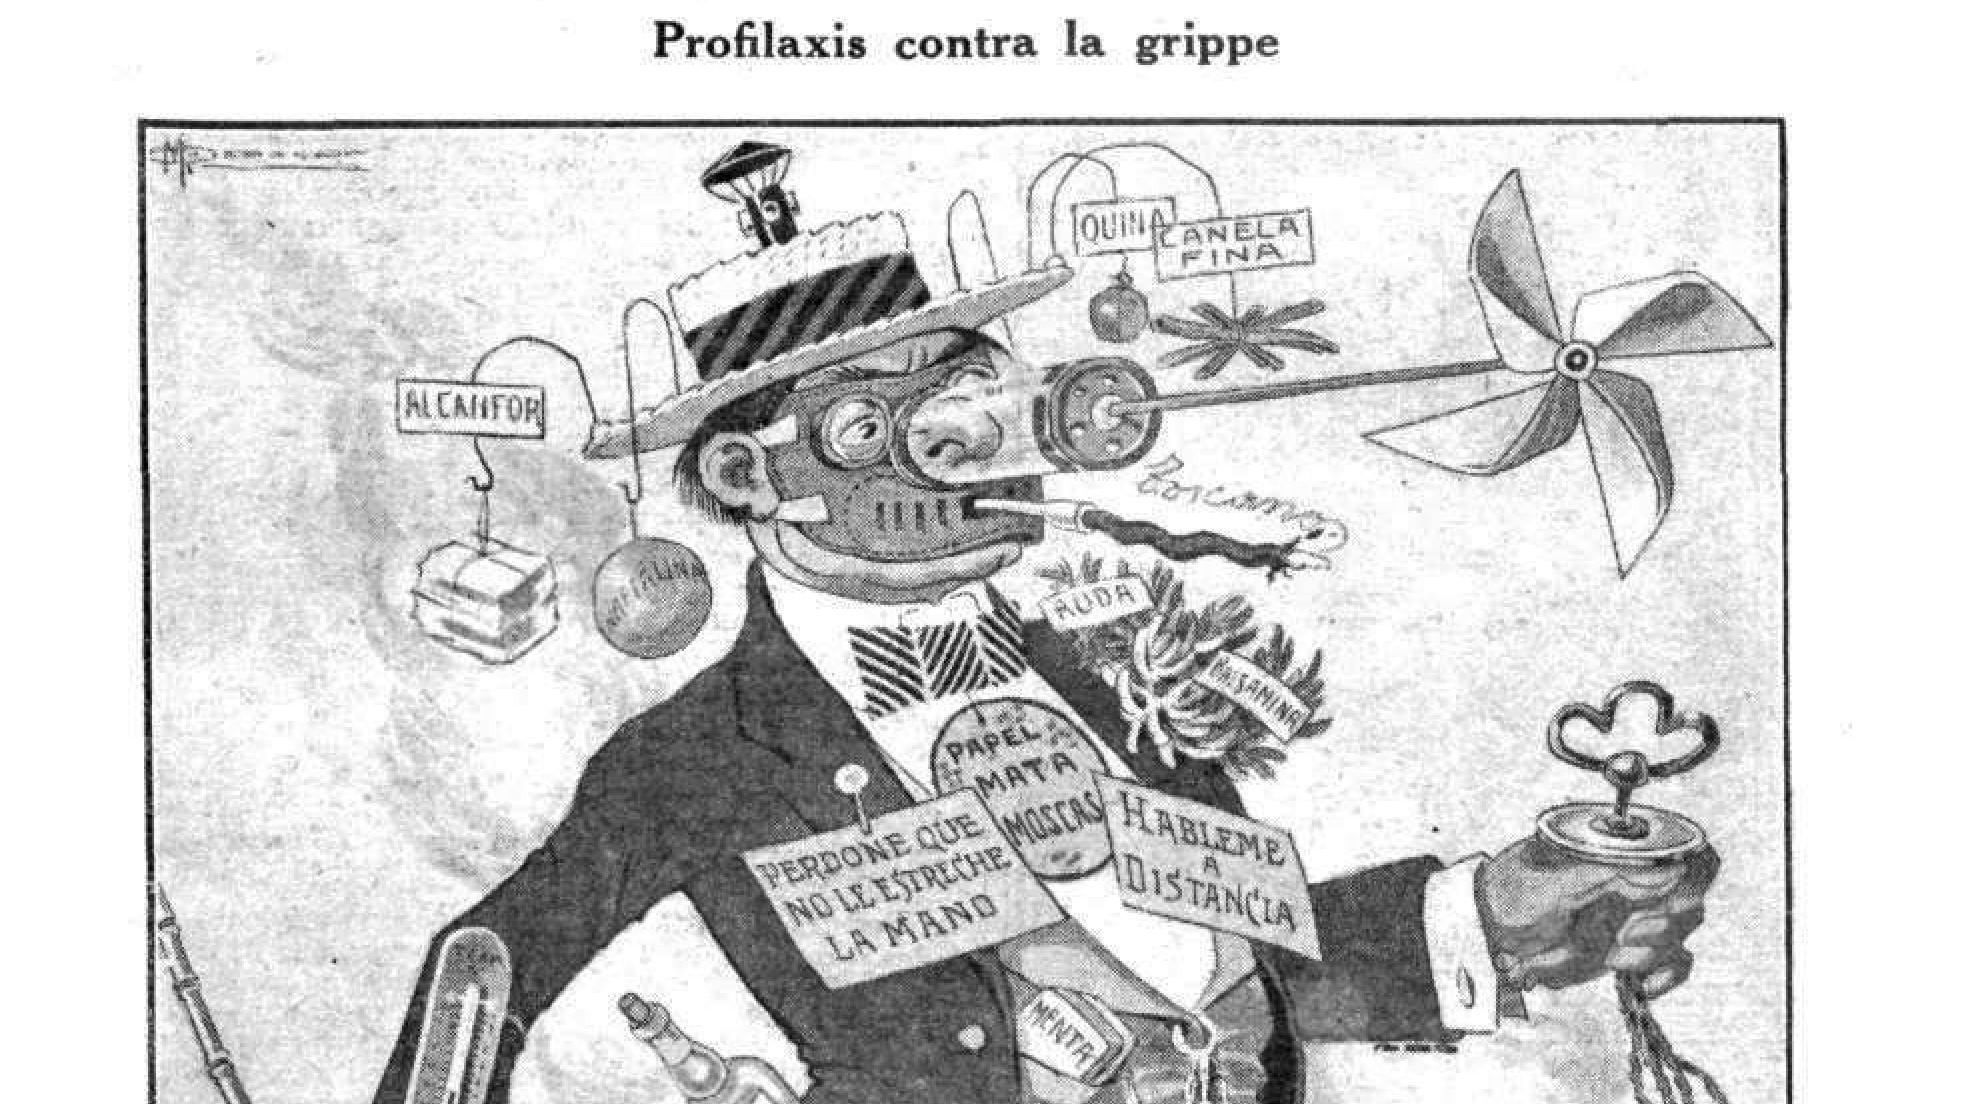 La gripe española – Caras y Caretas